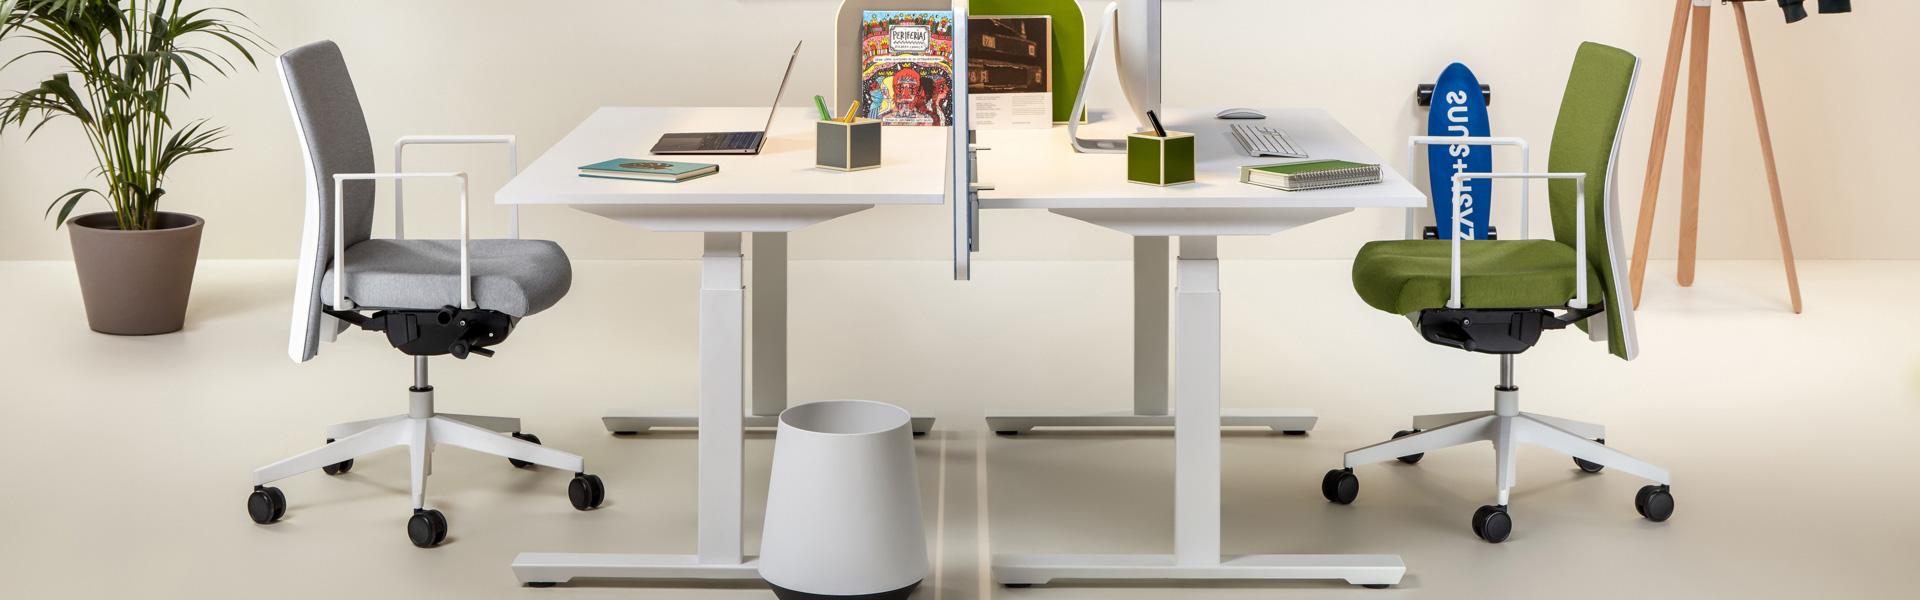 TCare height adjustable table